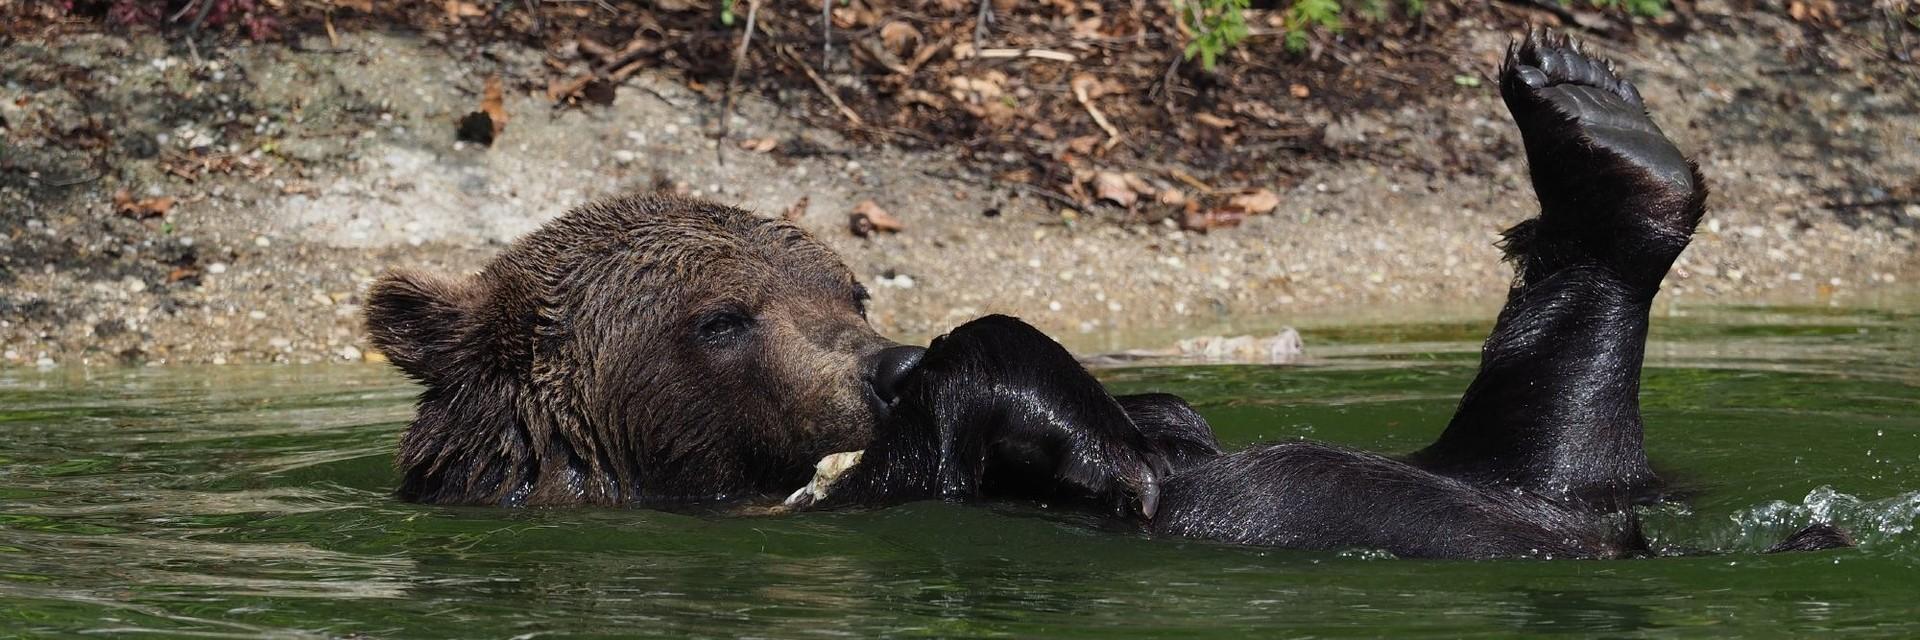 Bears love to swim